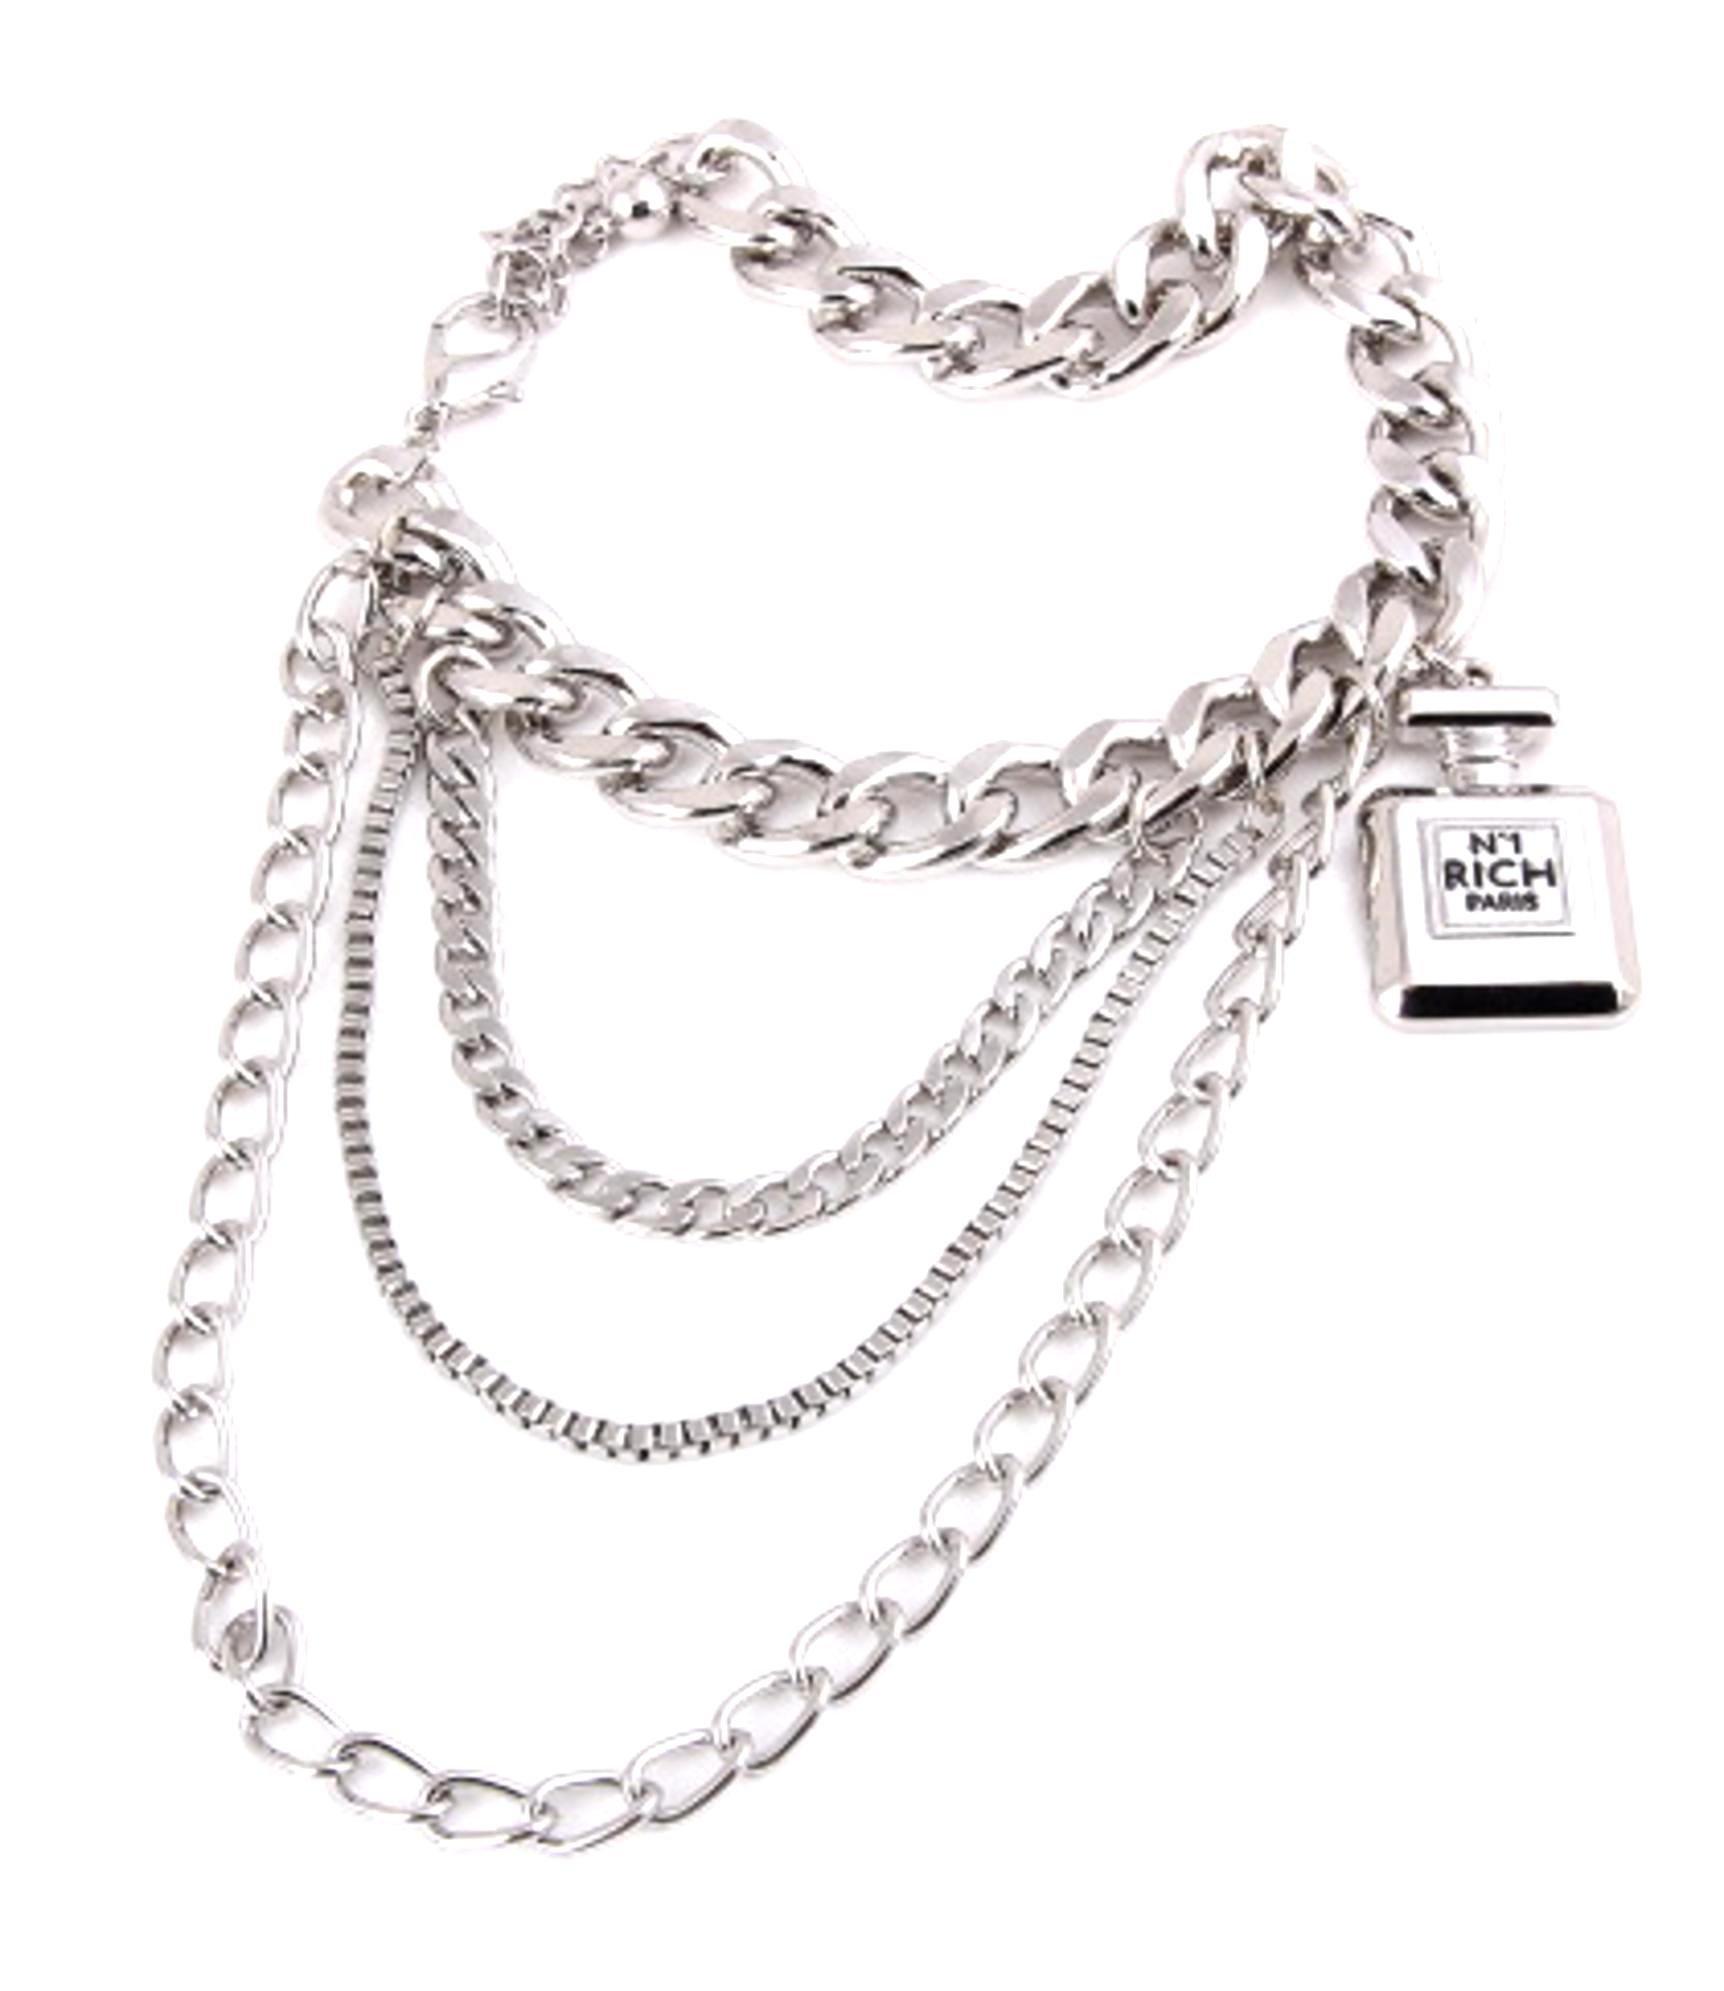 Fashion Trendy Shoe Chain - Anklet For Women - Unisex / AZFJBT (AZFJBT025-SIL)